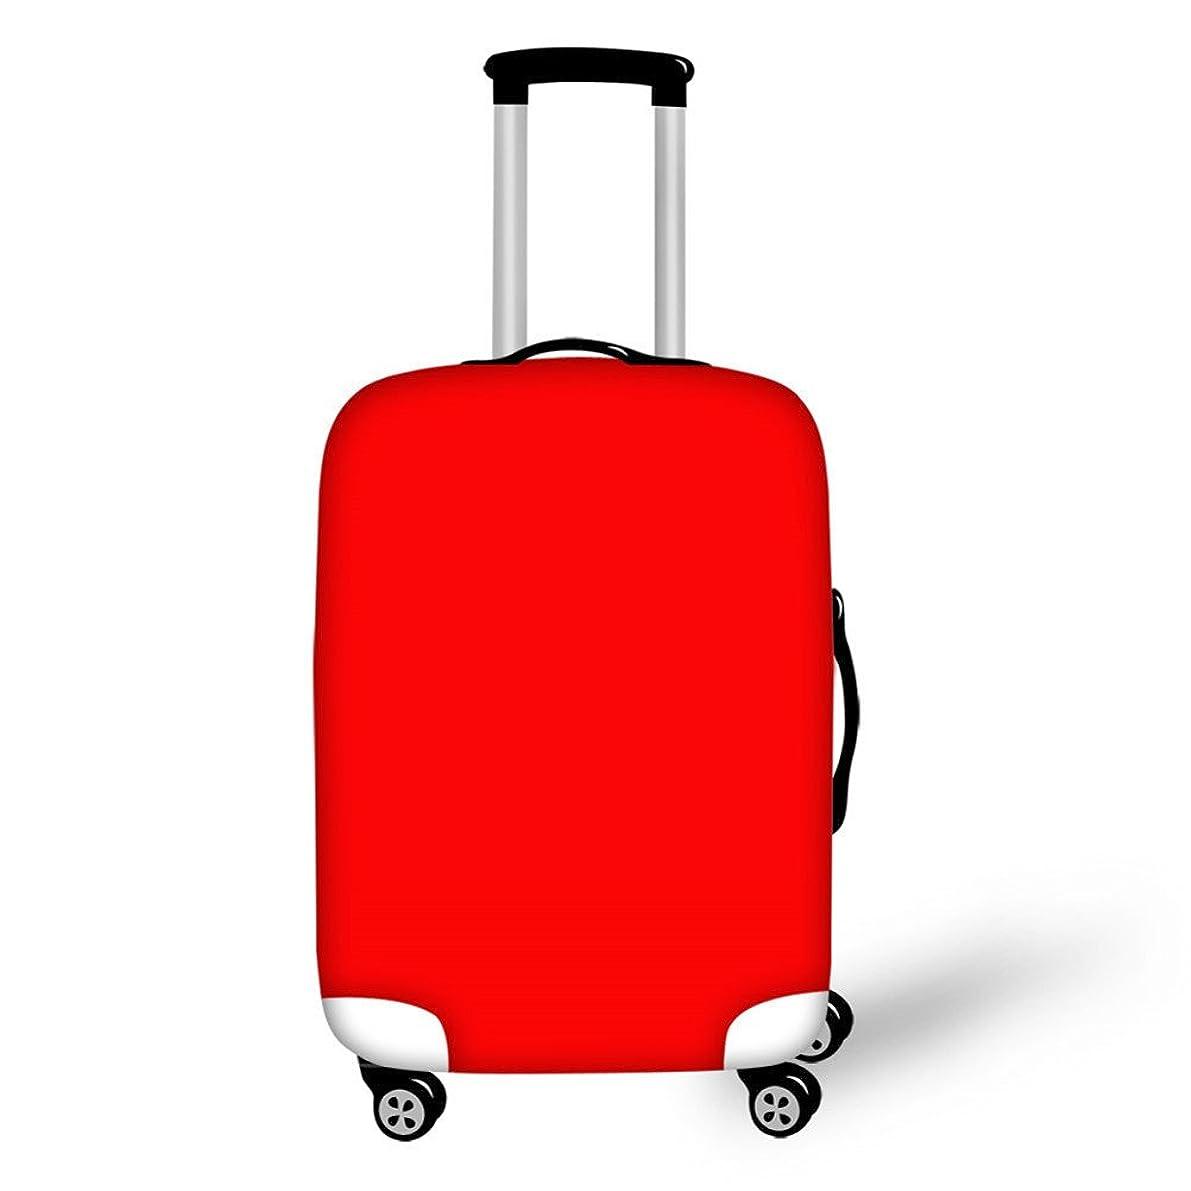 FOR U DESIGNS(JP) スーツケースカバー 伸縮素材 保護 盗難防止 防塵 おしゃれ